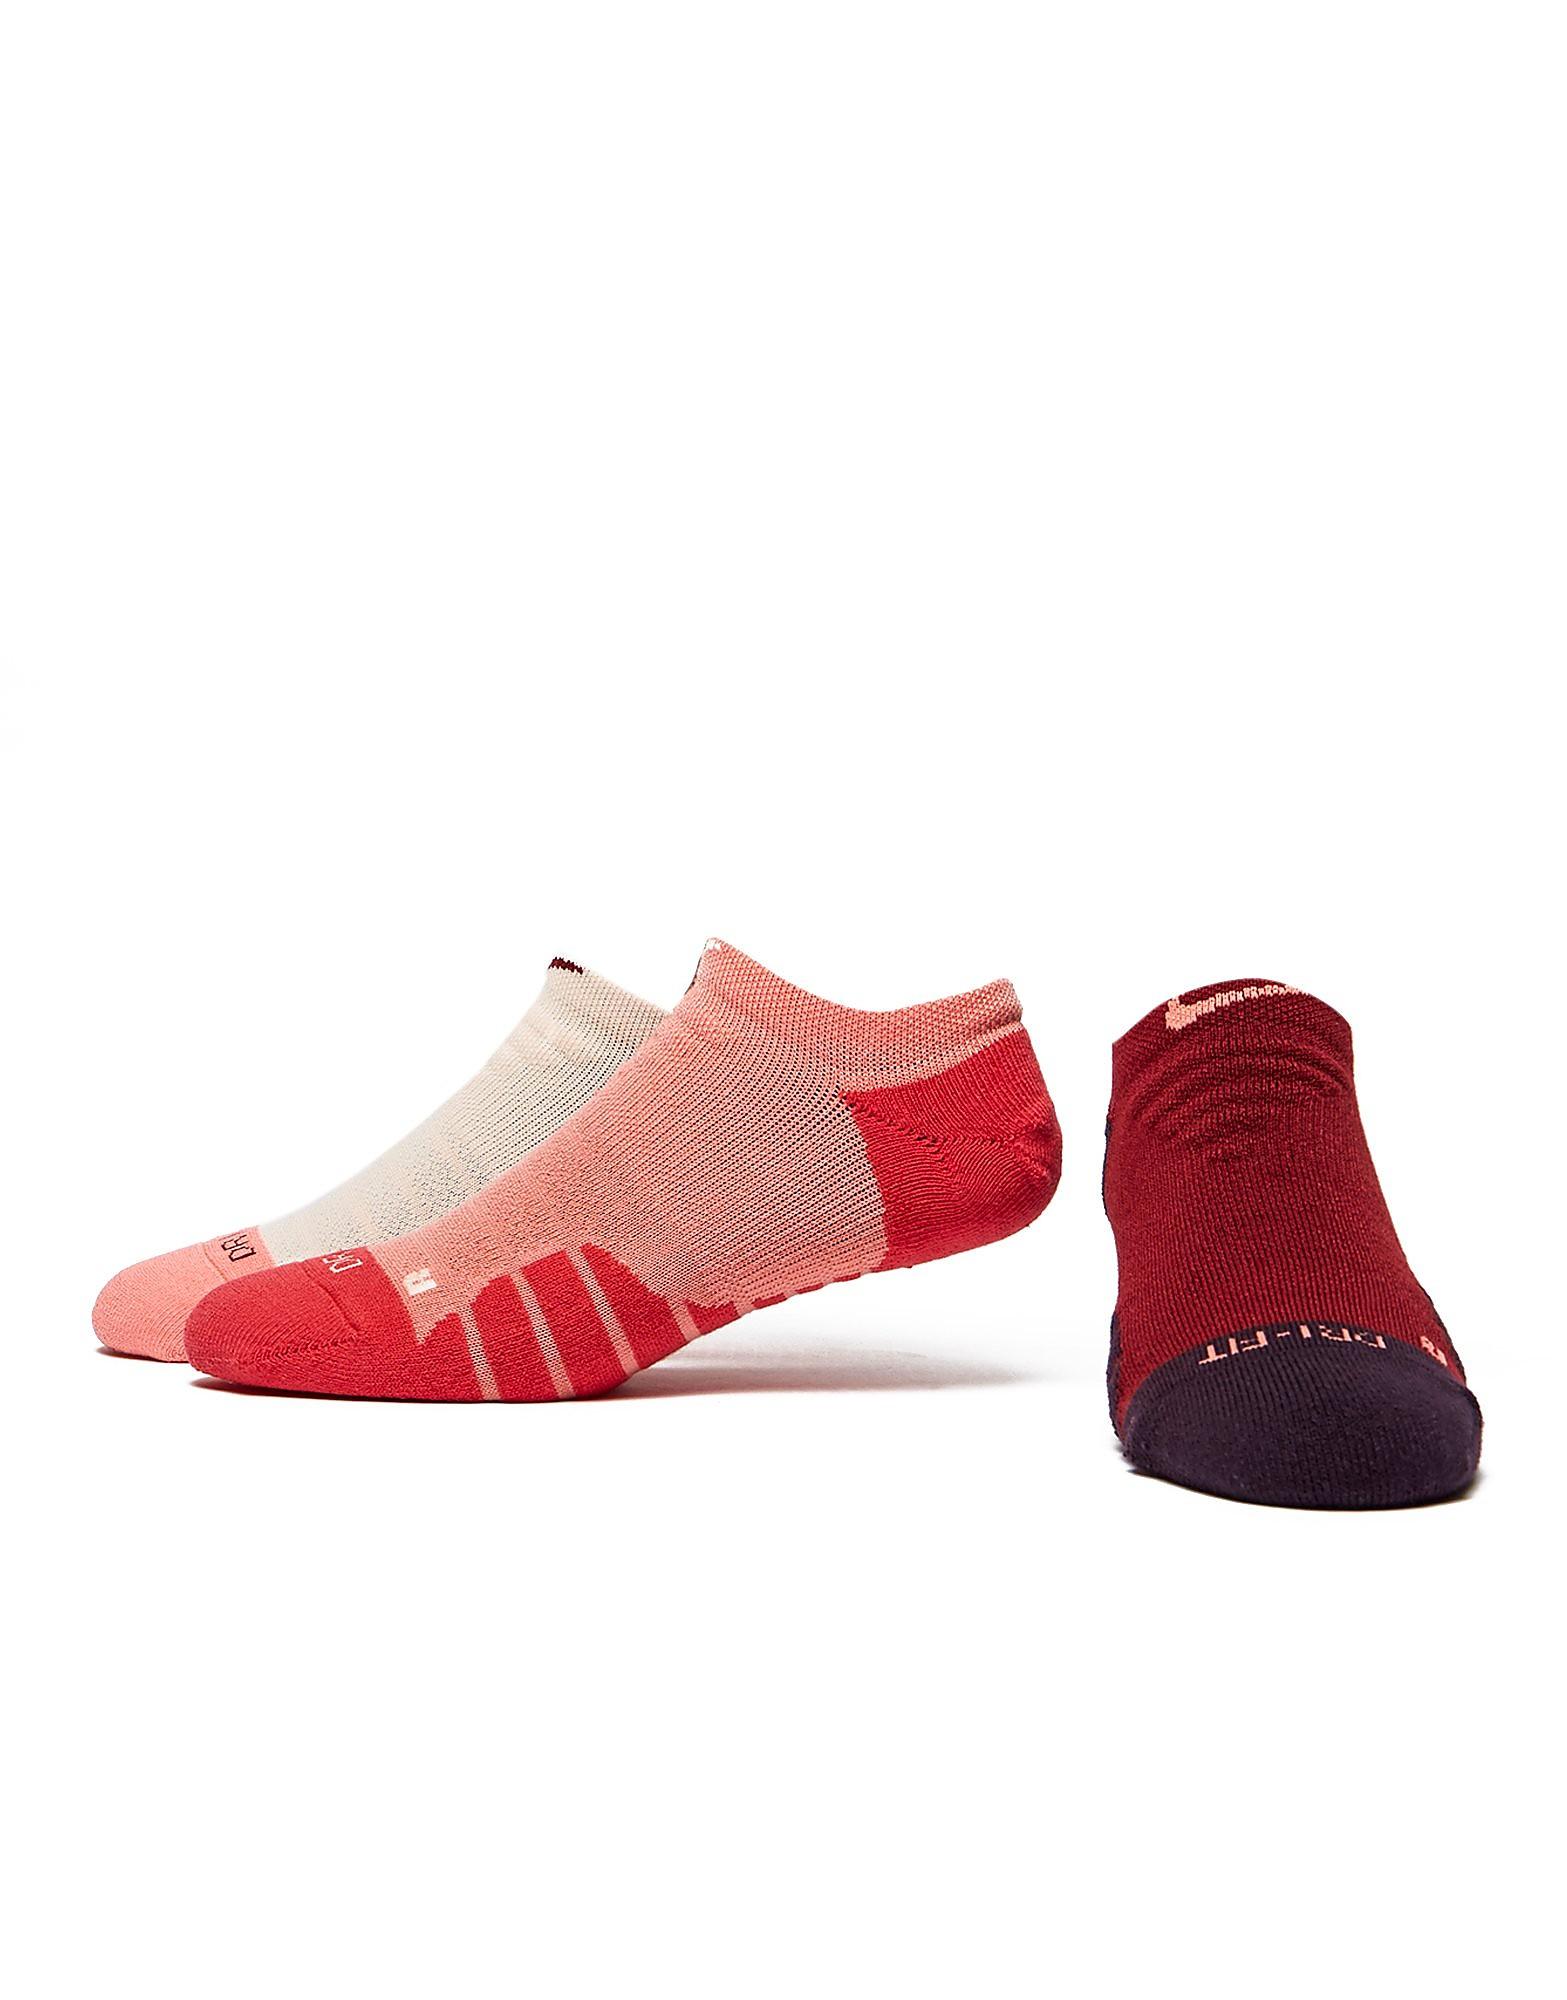 Nike Chaussettes Dri-FIT Quarter